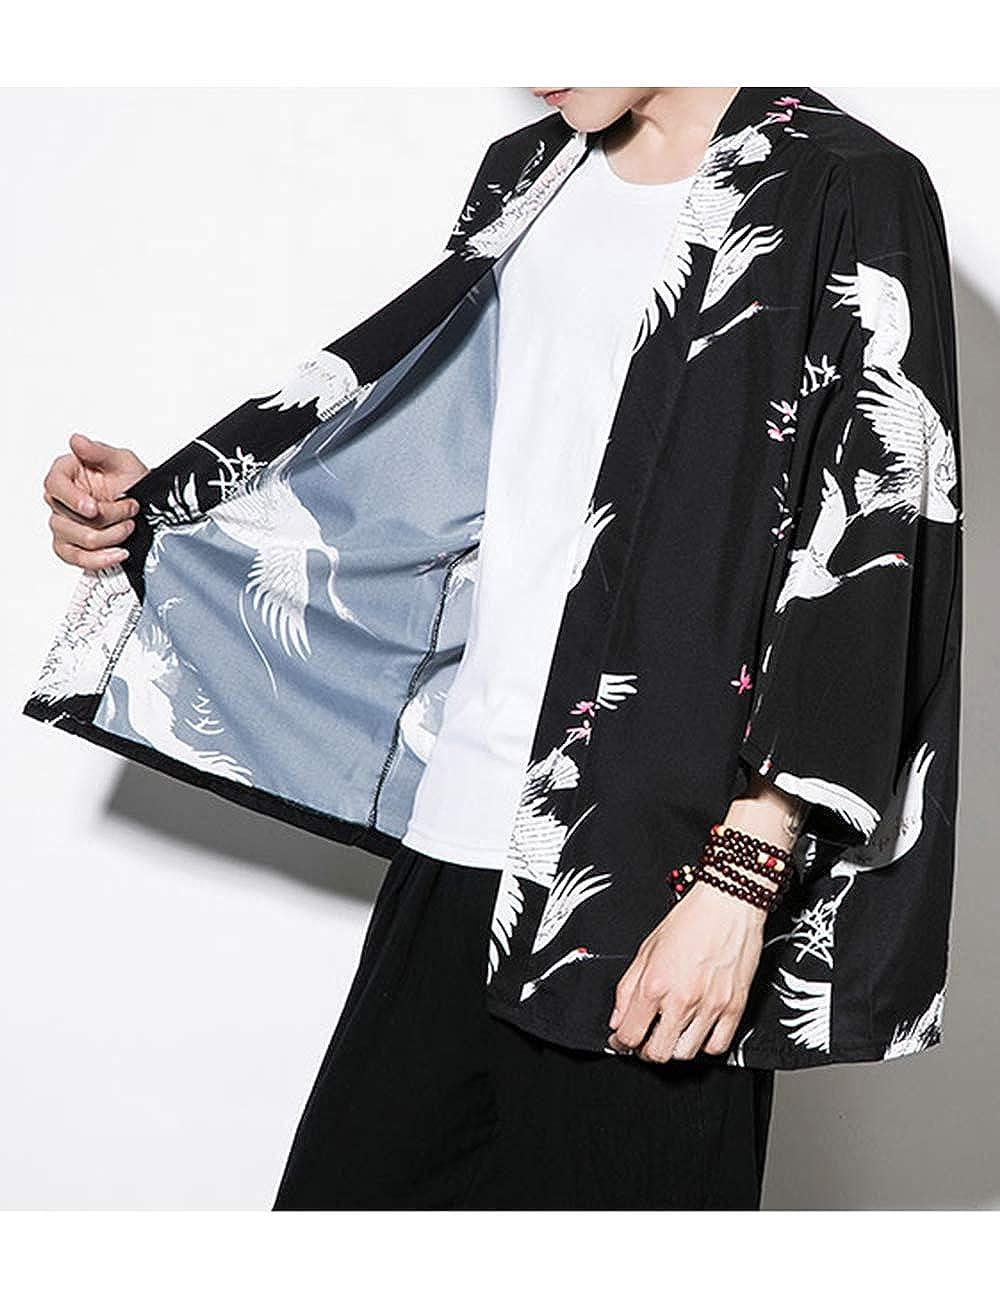 besbomig Haori Jacket Cloak Fashion Abiti Giapponesi Capispalla da Uomo Cardigan Kimono Casual Hippie